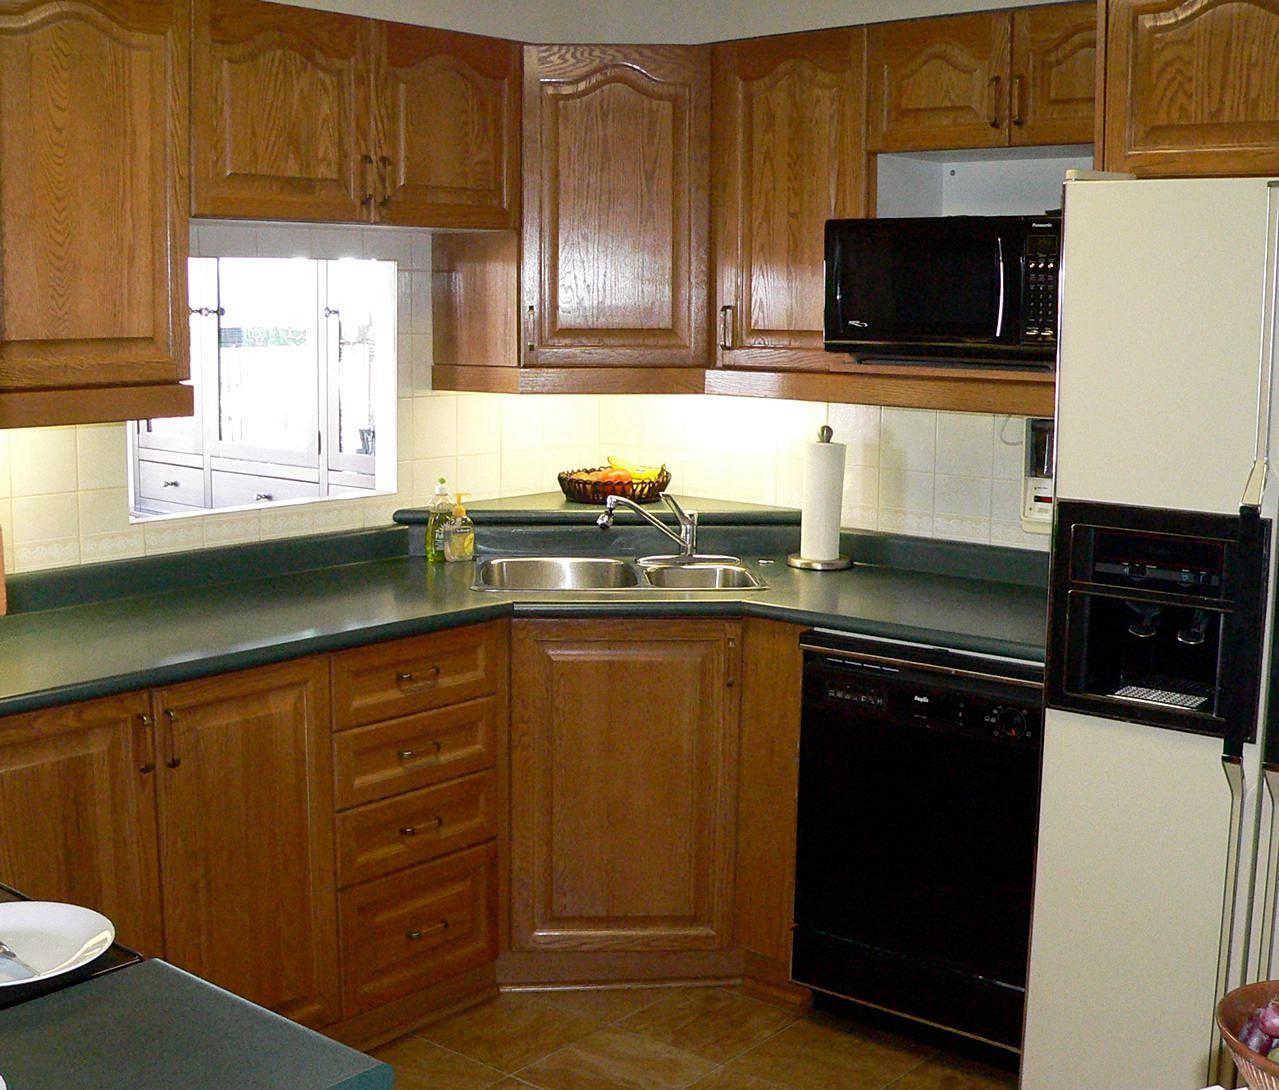 Kitchen Refinishing Cabinets: Neff Custom Finishing Kitchen Cabinet Refinishing